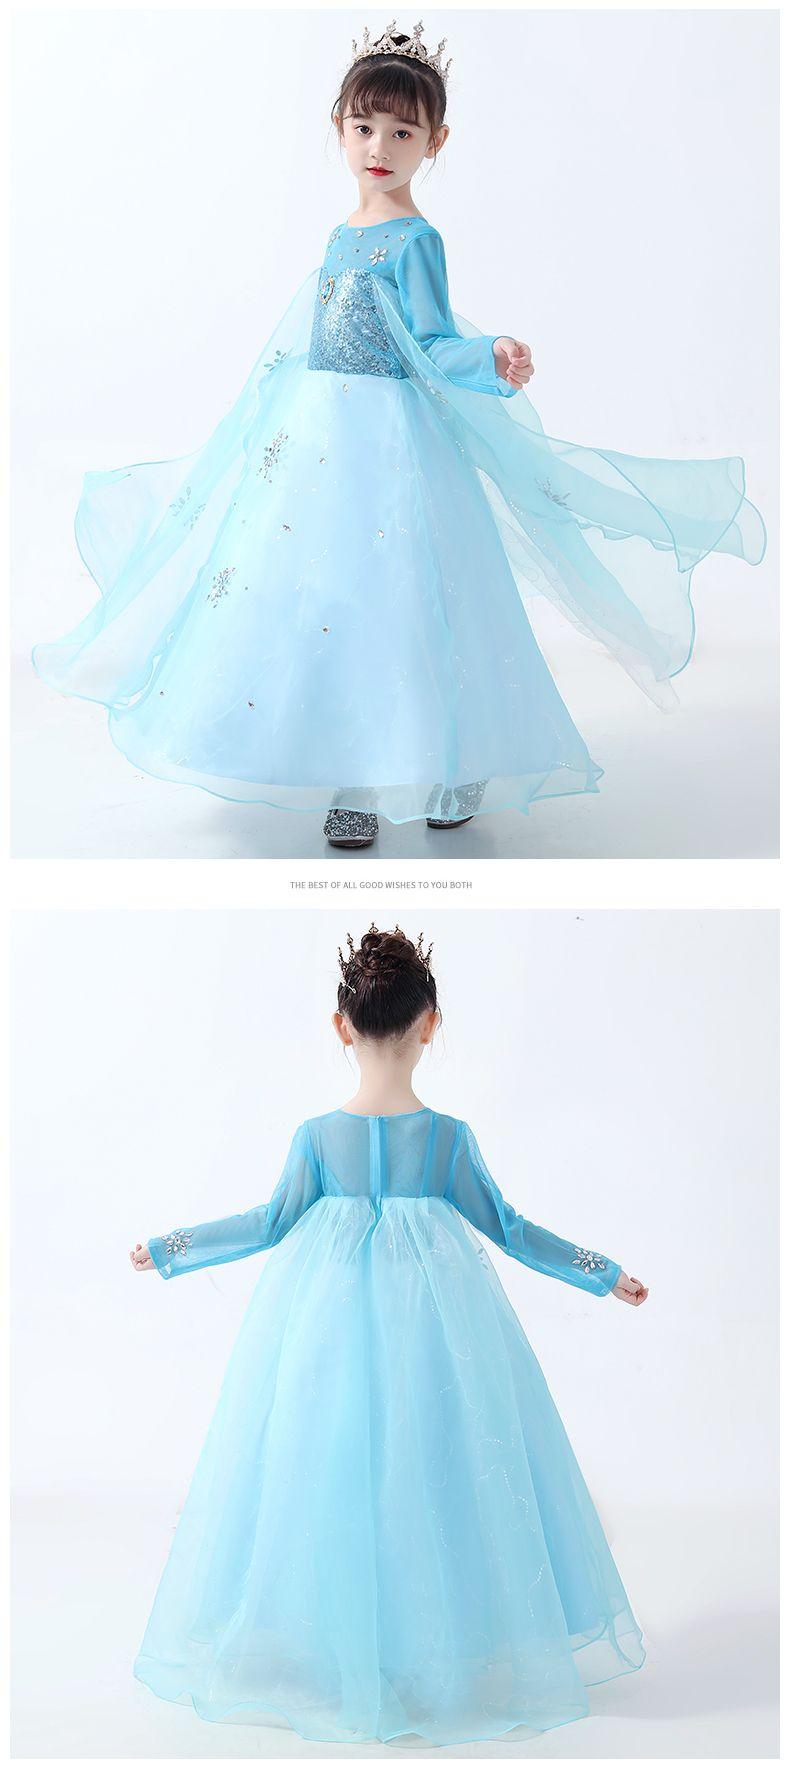 Girls Quality Disney Frozen 2 Elsa Dress Elsa Dress Up